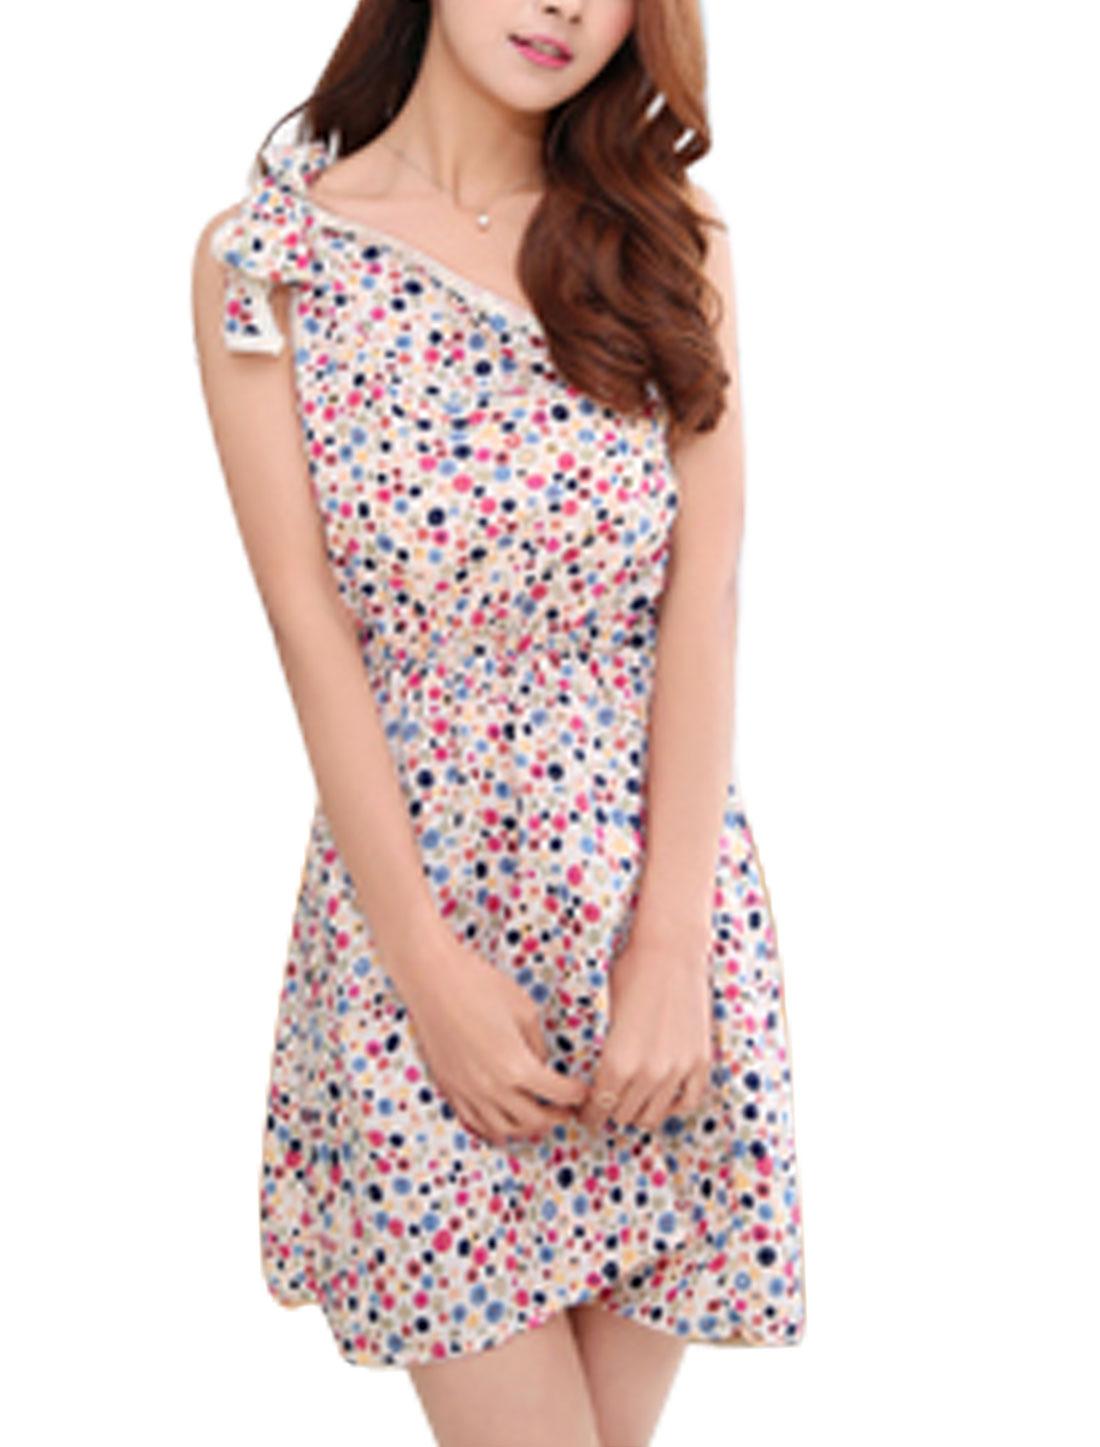 Women Elastic Waist Floral Dots Print One Shoulder Casual Dress Red Beige XS